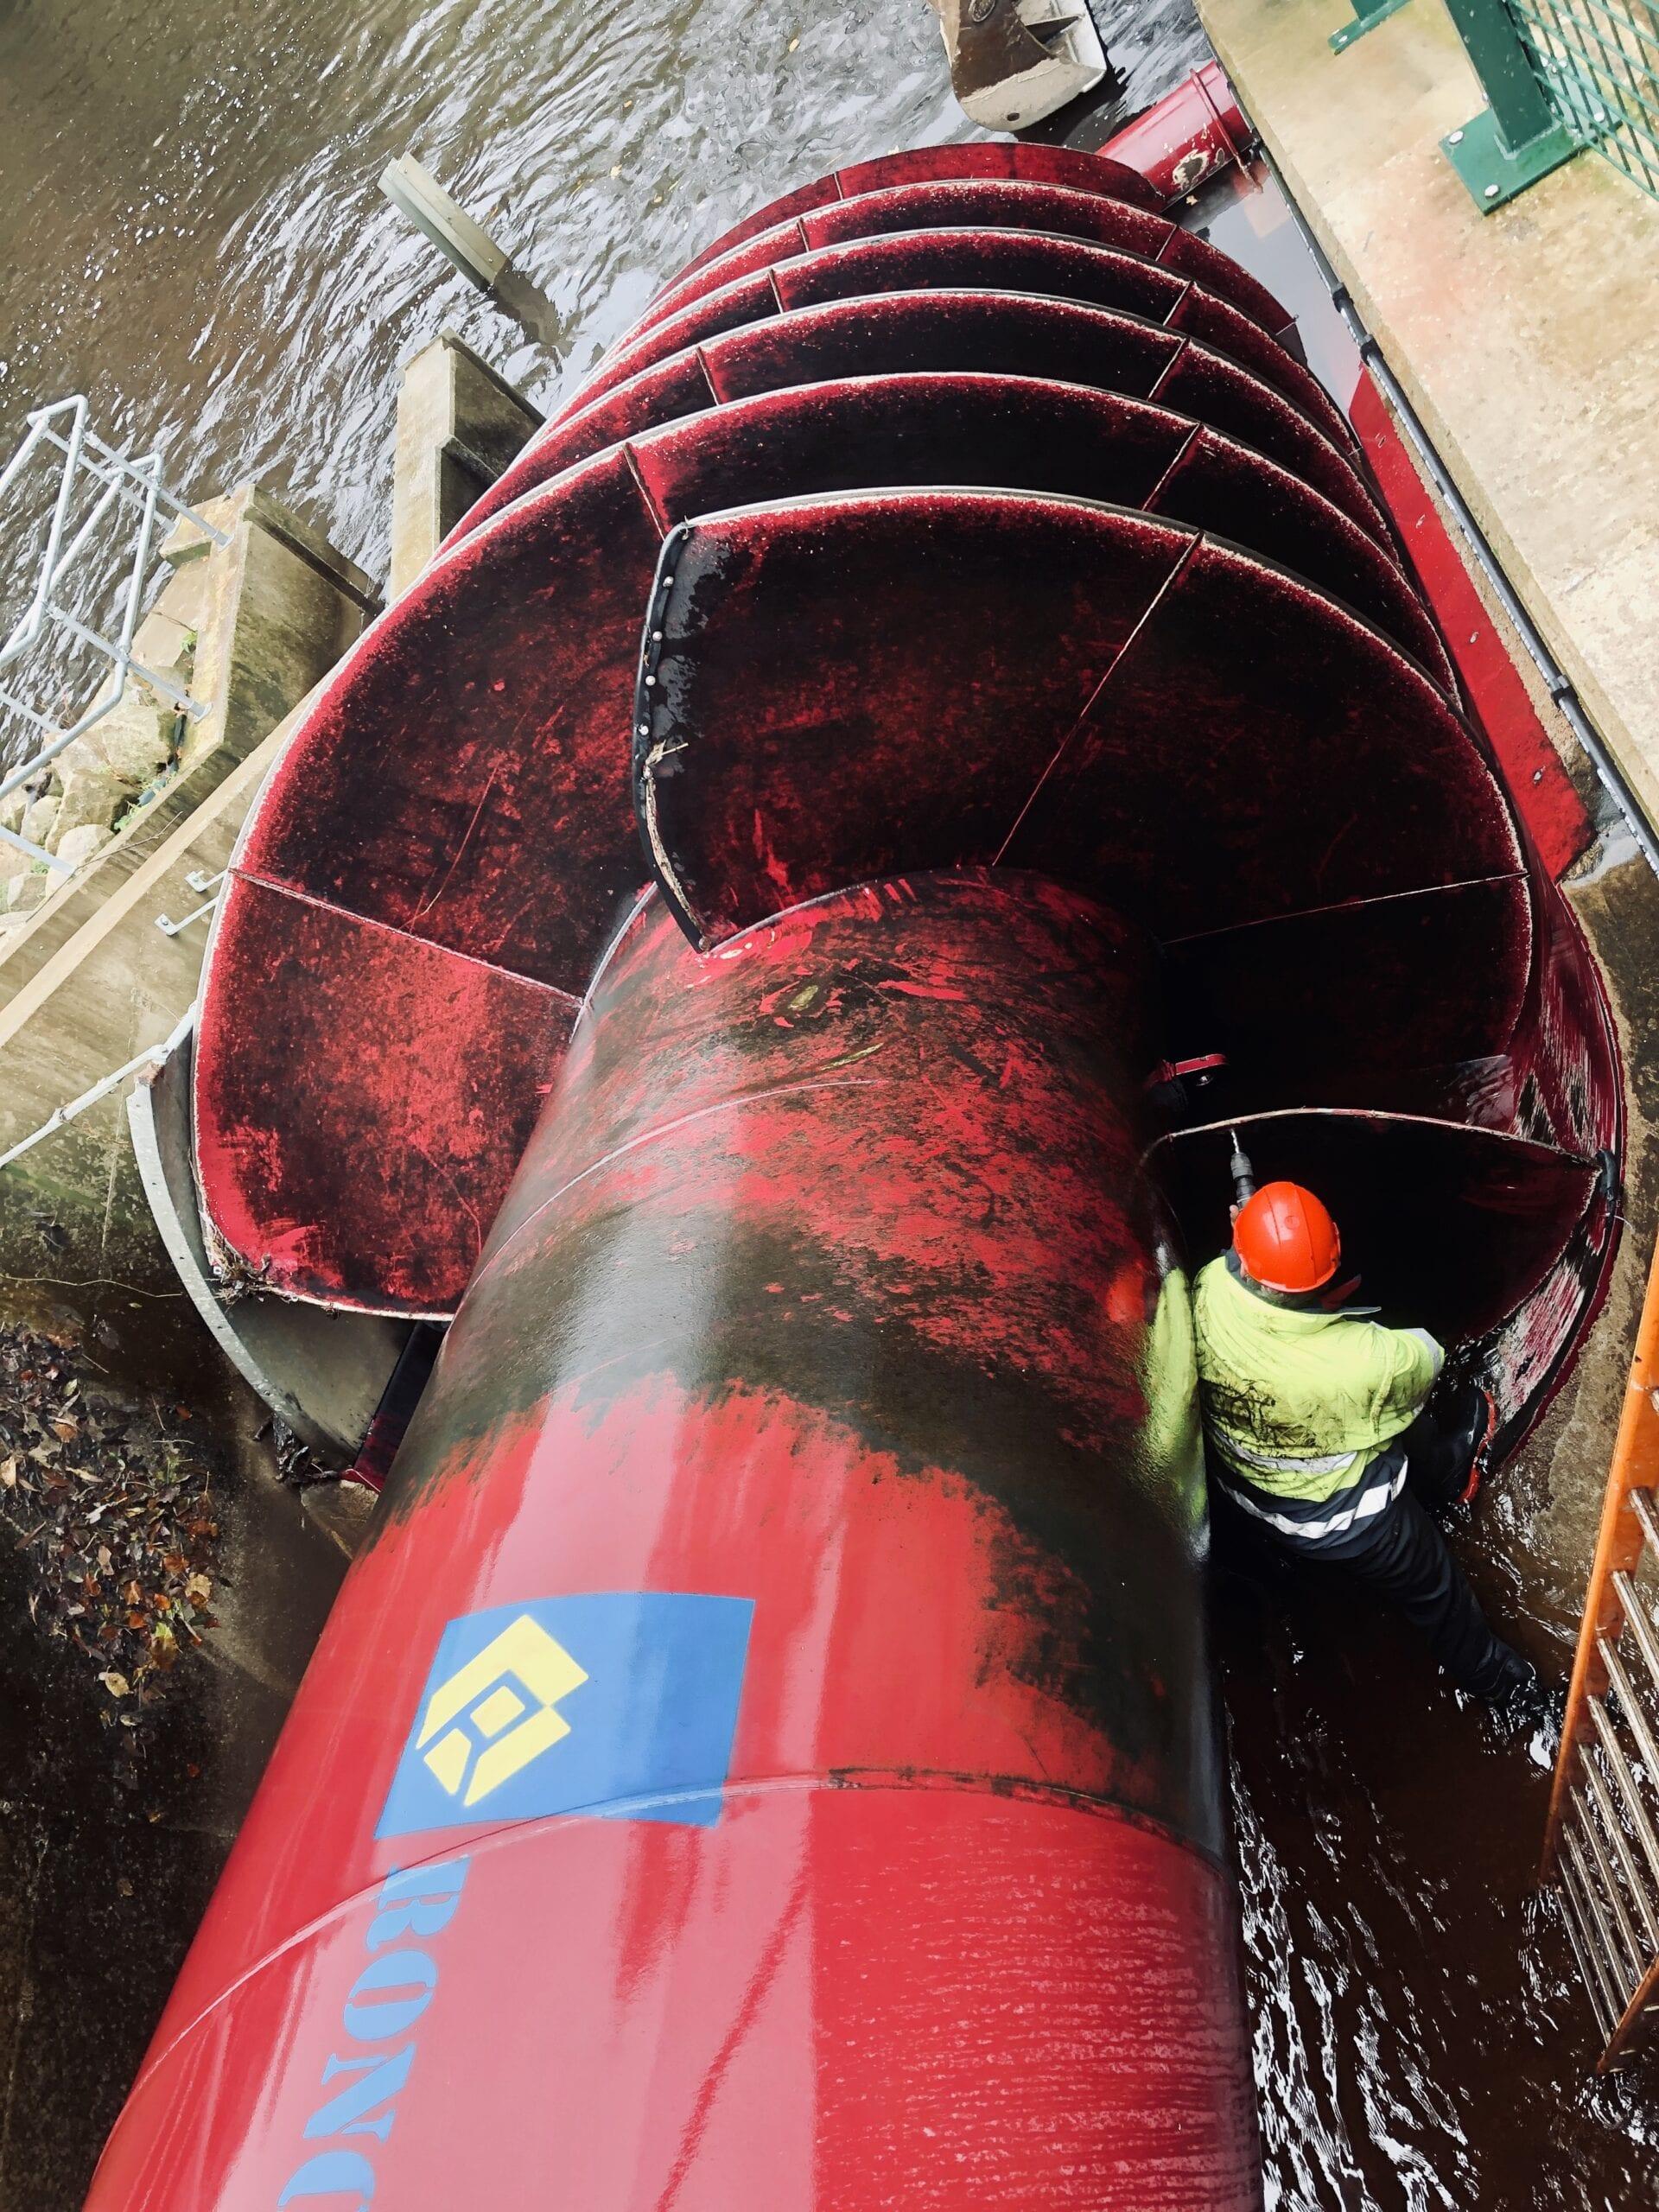 hydro turbine maintenance